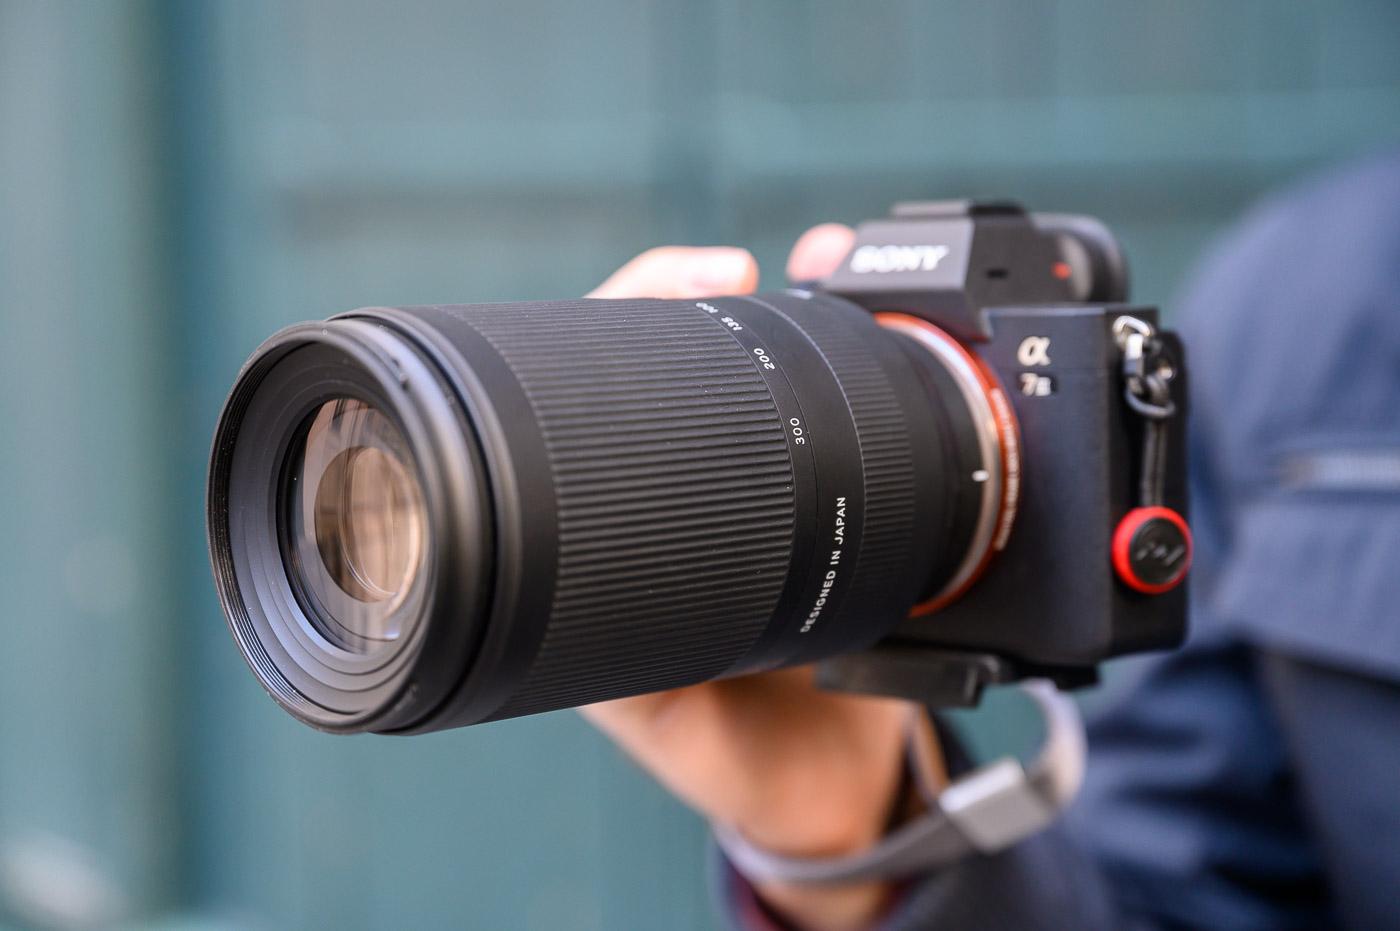 Test Tamron 70-300 mm f/4,5-6,3 Di III RXD, téléobjectif léger et abordable pour hybrides Sony